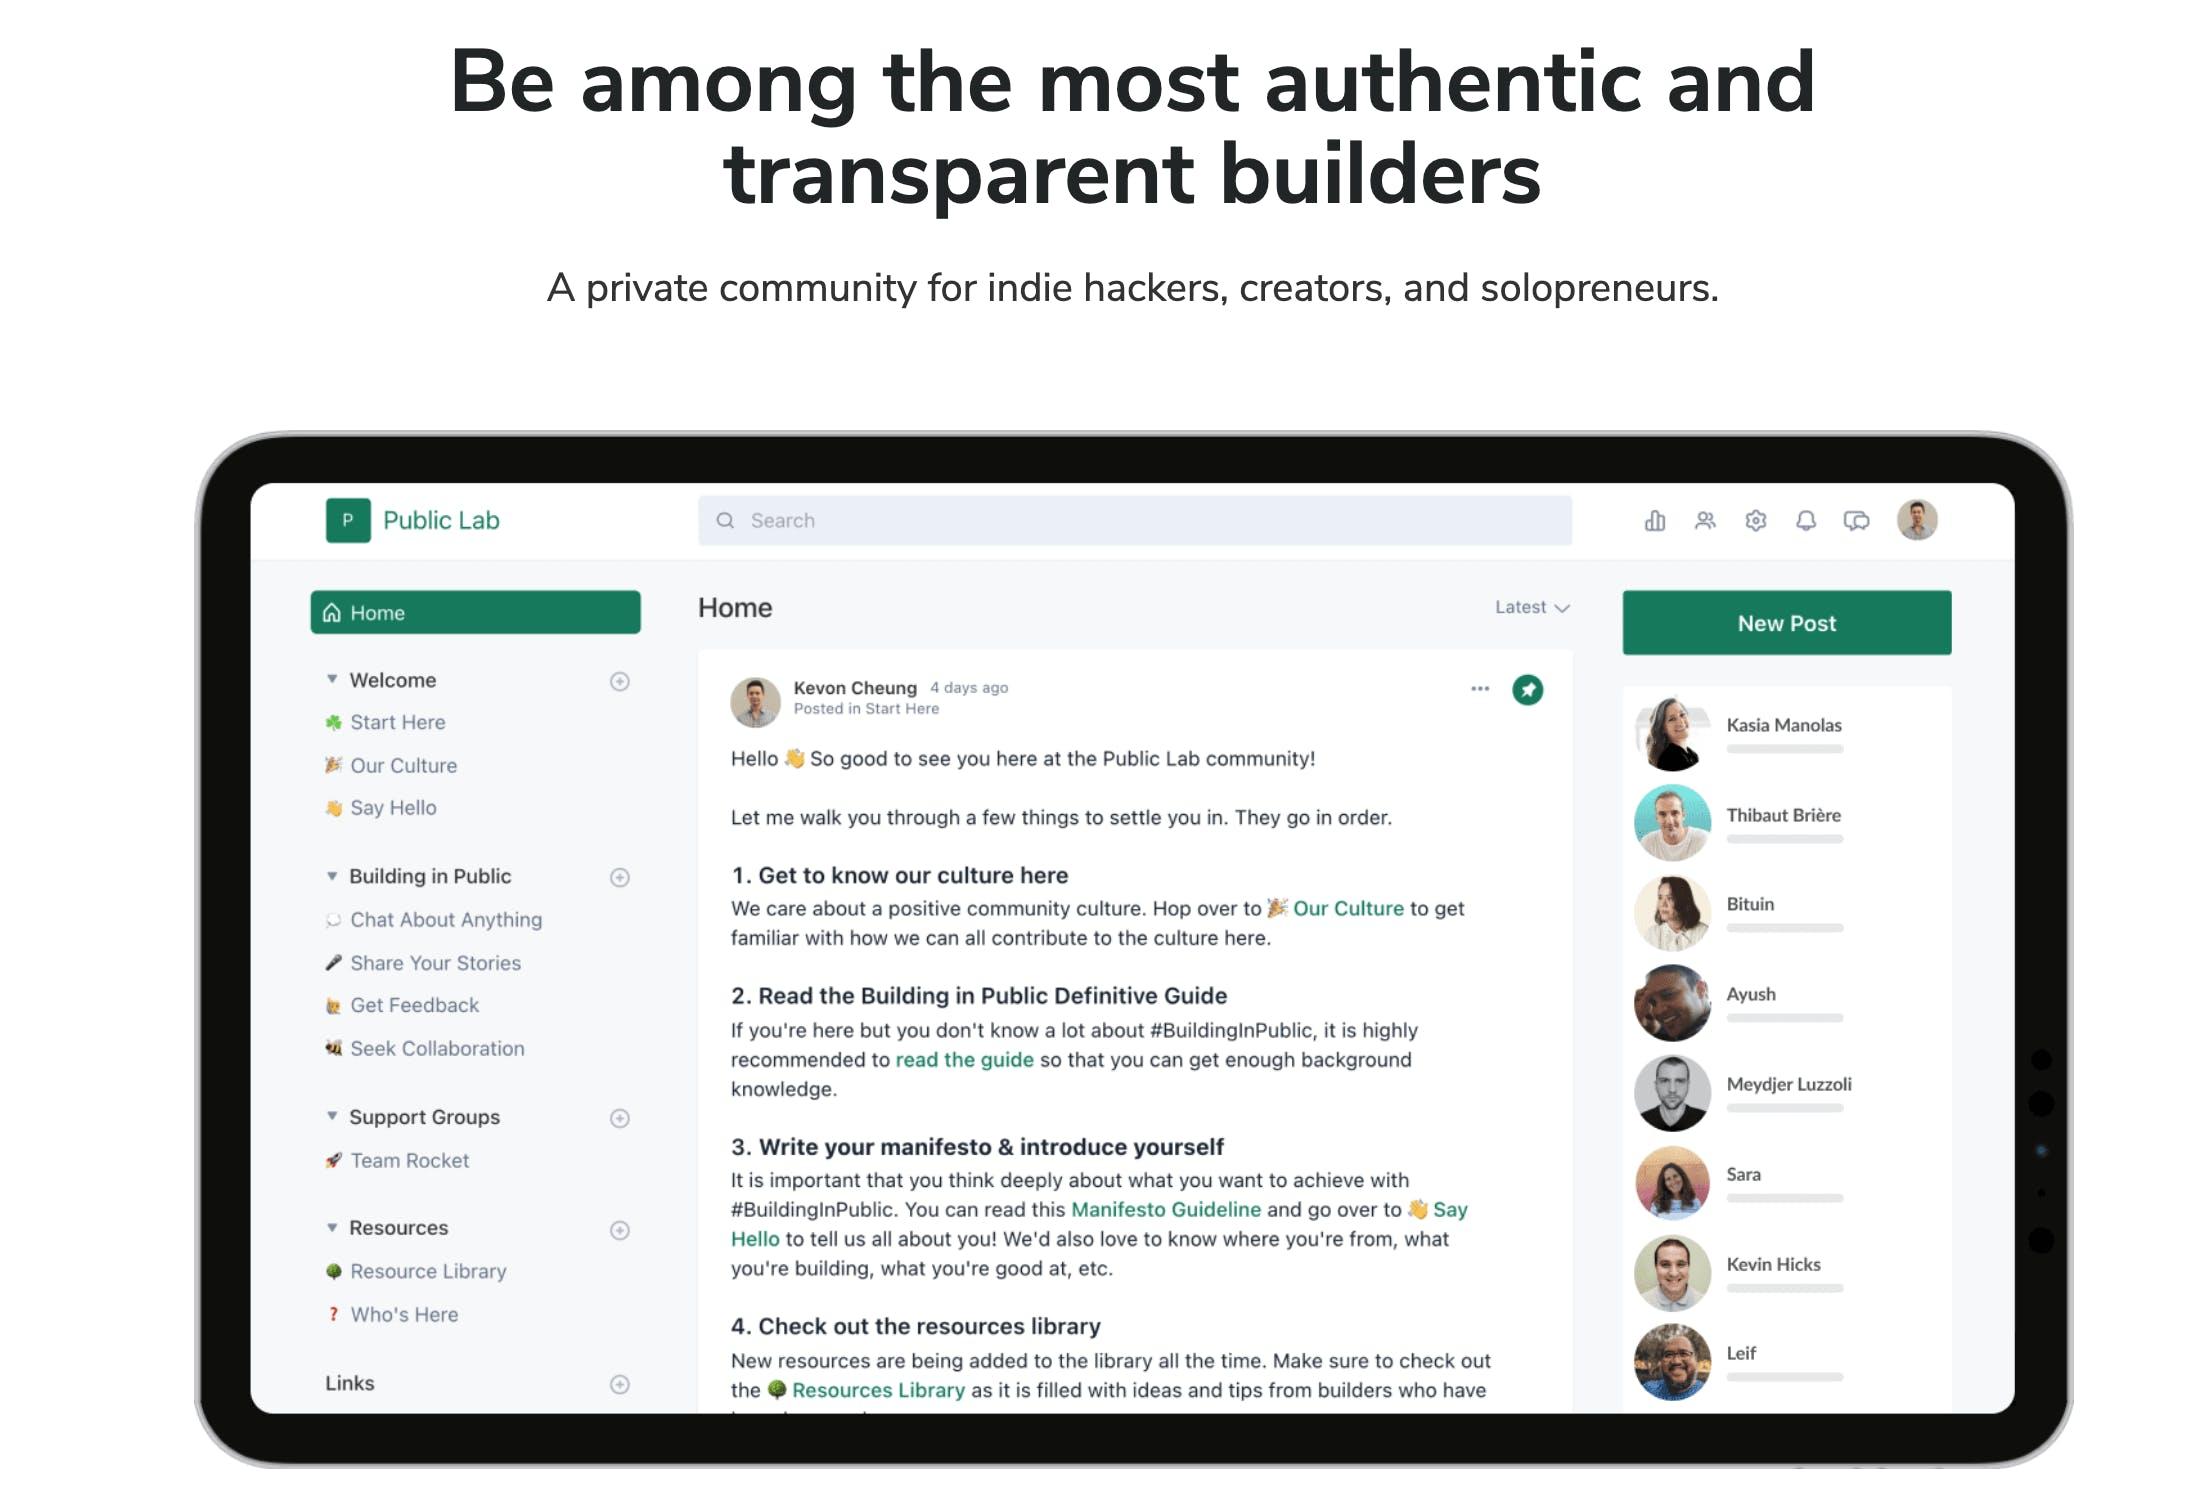 Public Lab community